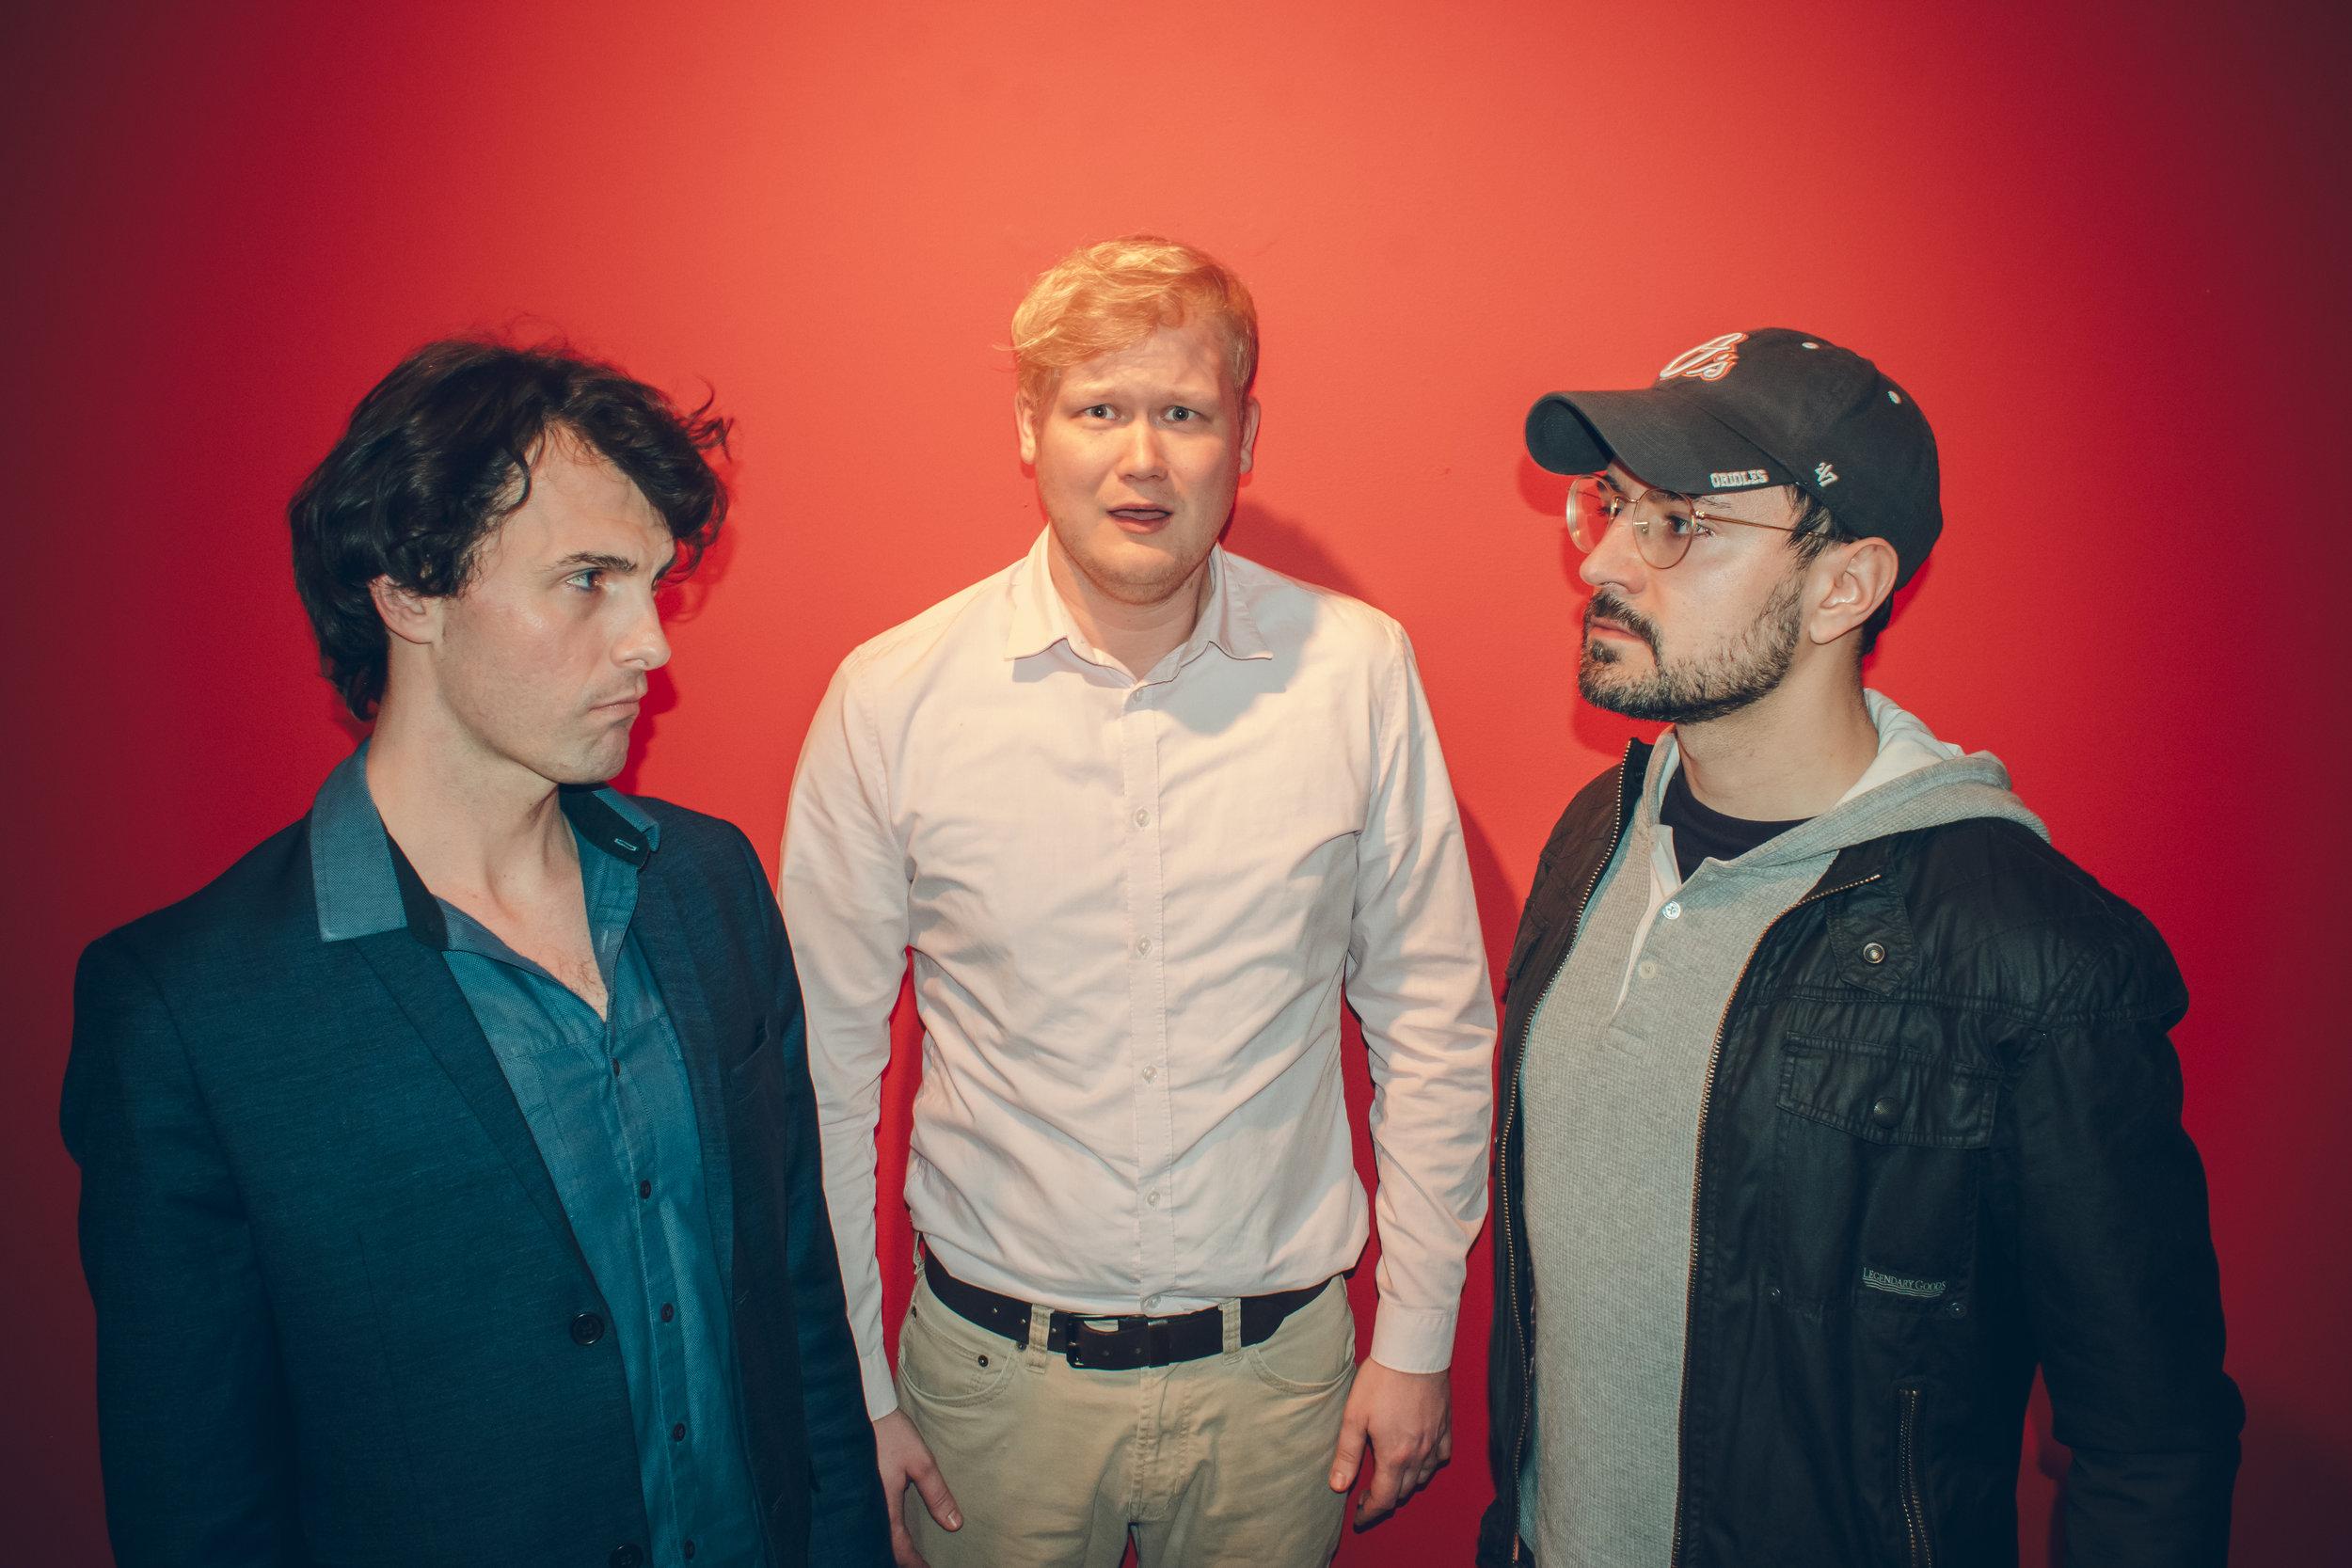 Jonathan Mayo, Kyle Mundil, and Derek Rienzi Van Tassel